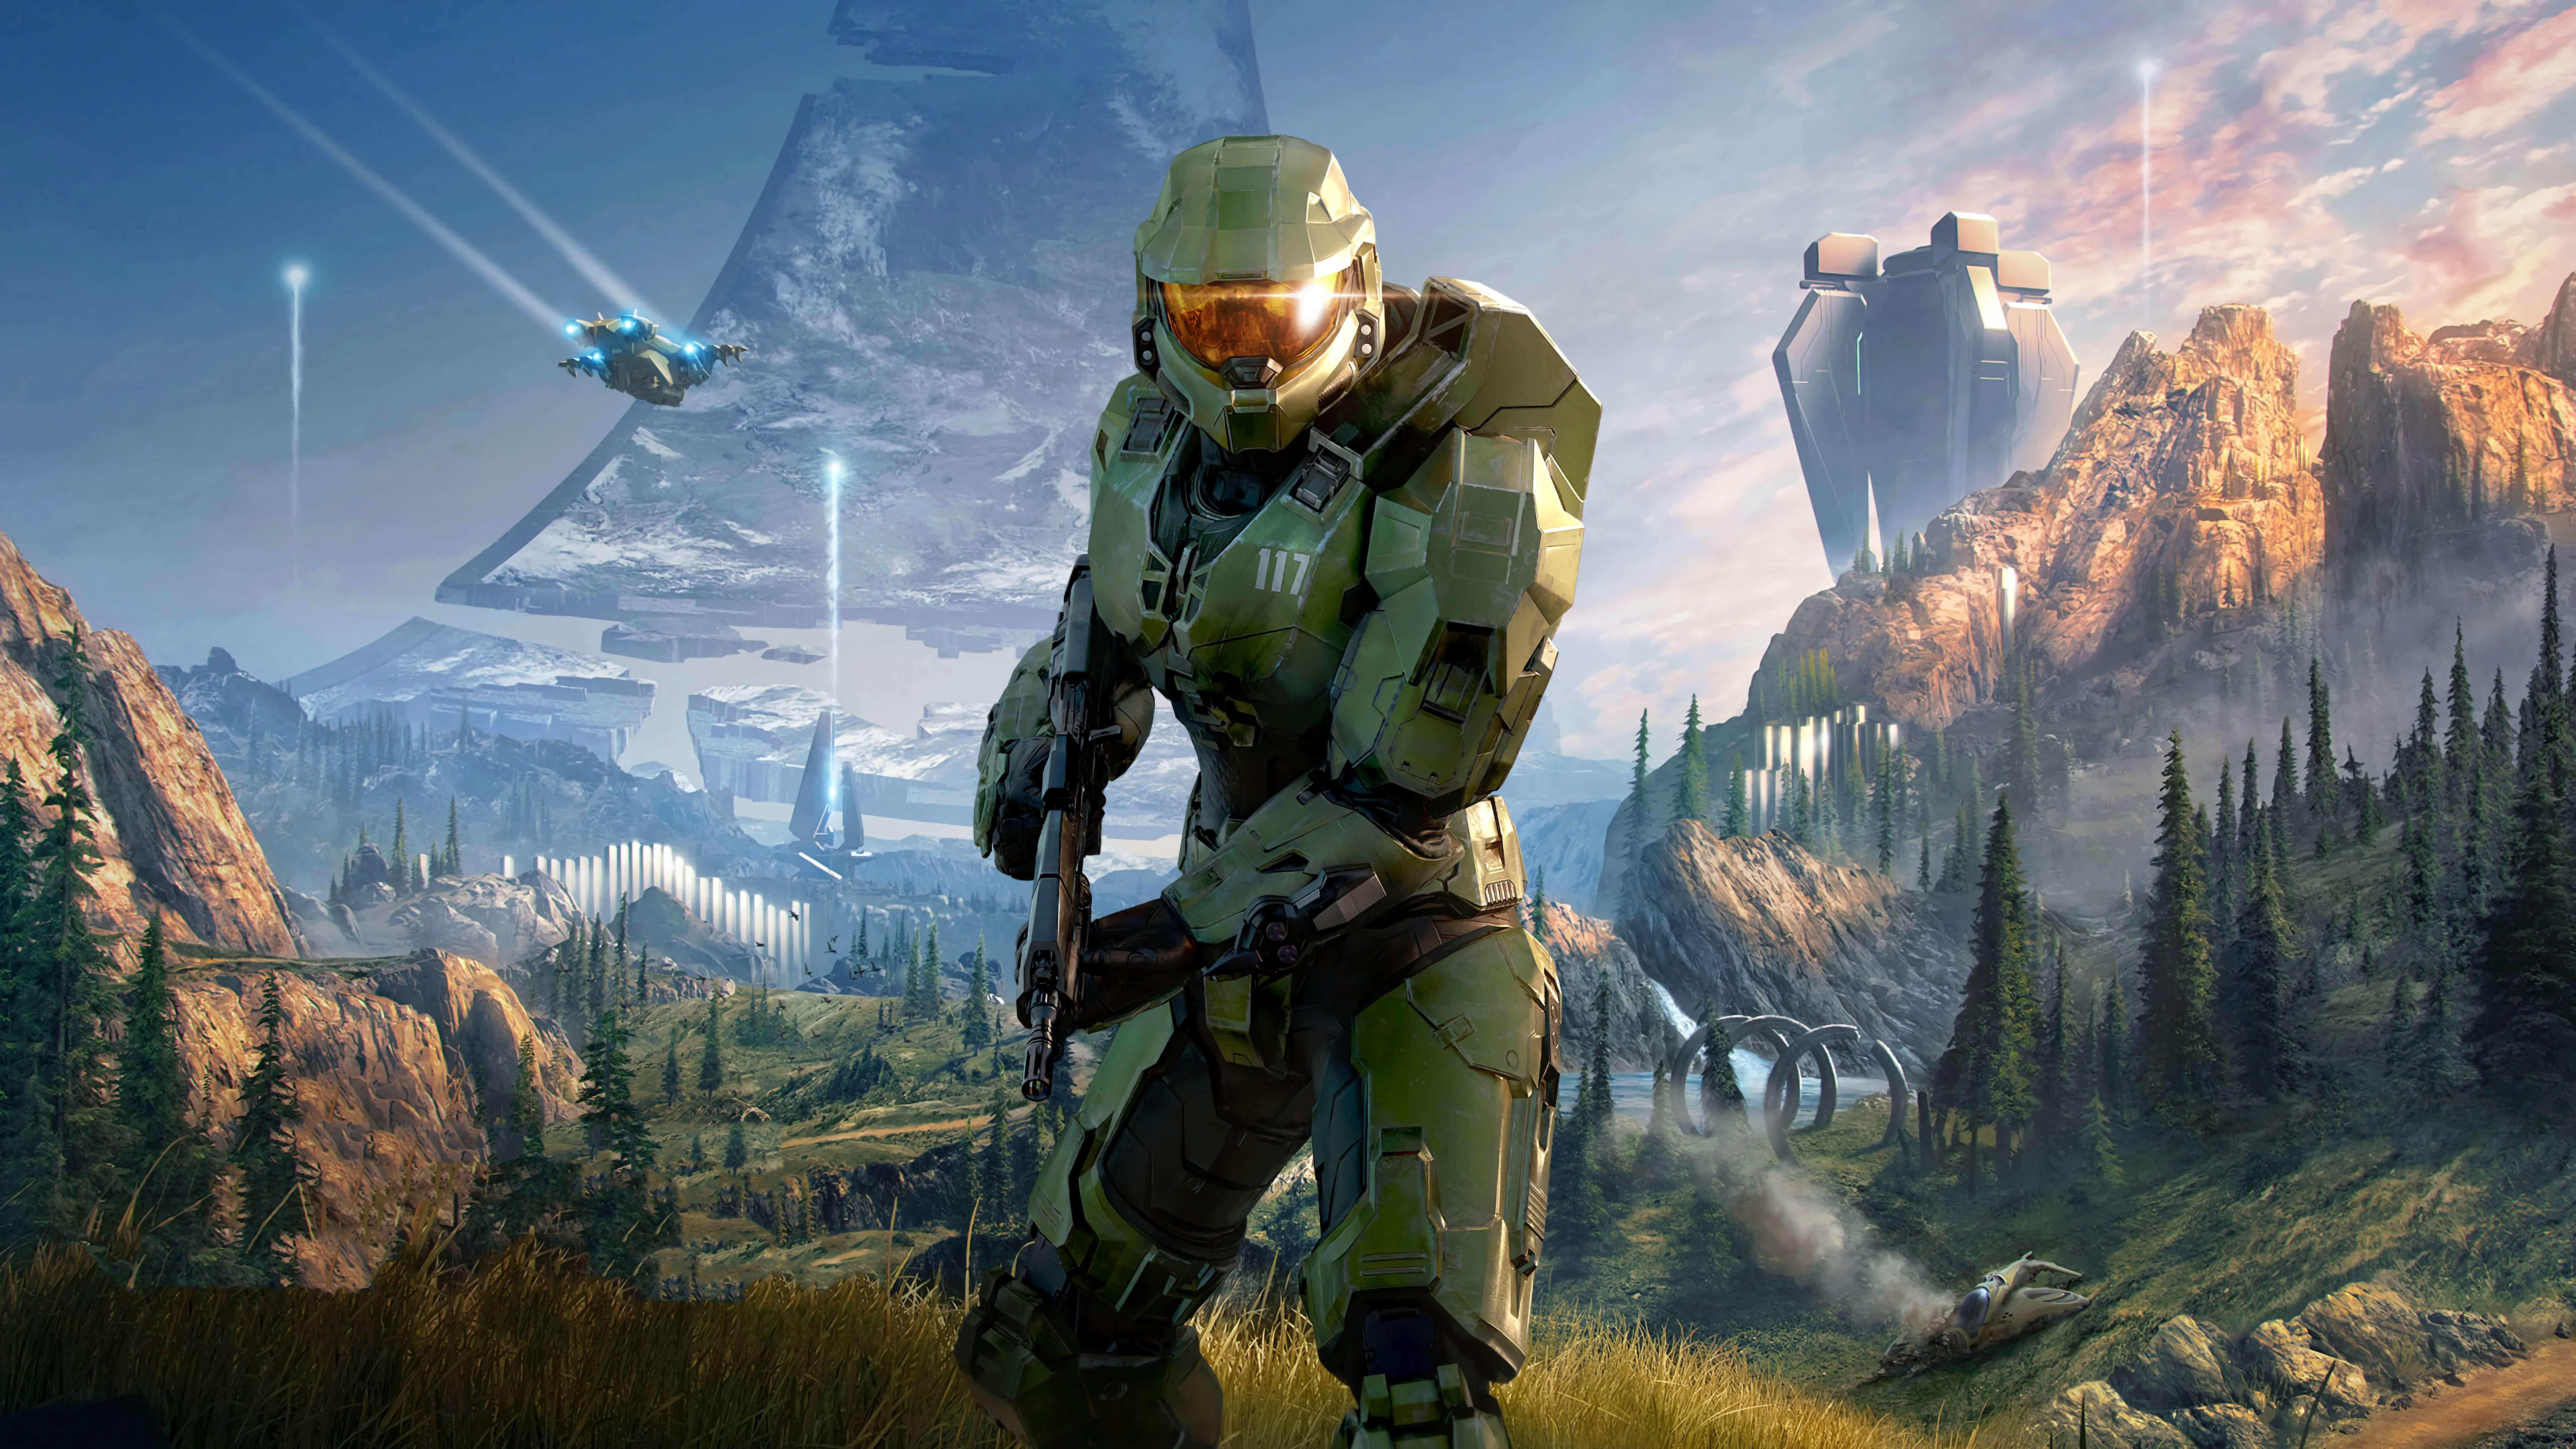 Fondos de pantalla Halo Infinite 2020